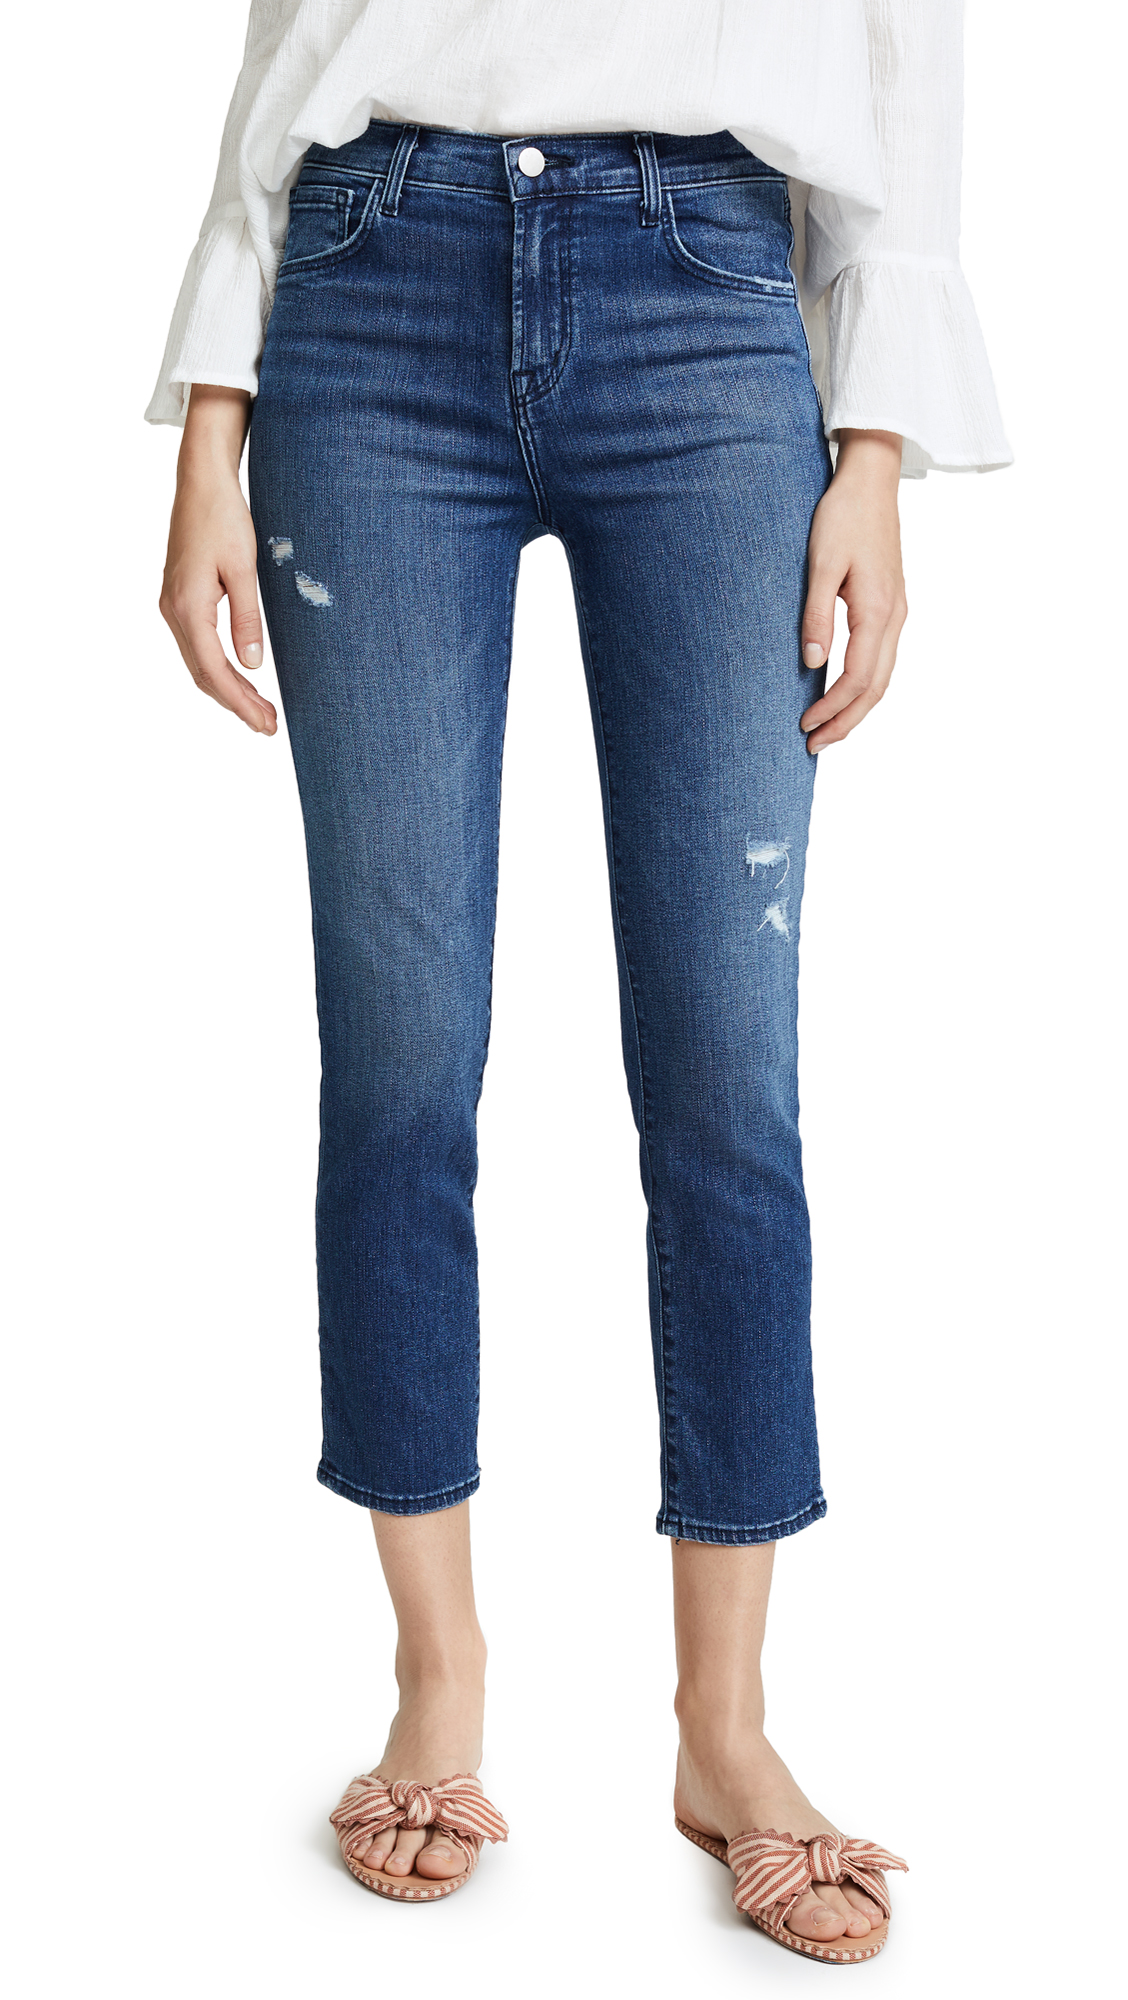 J Brand Ruby Crop Jeans